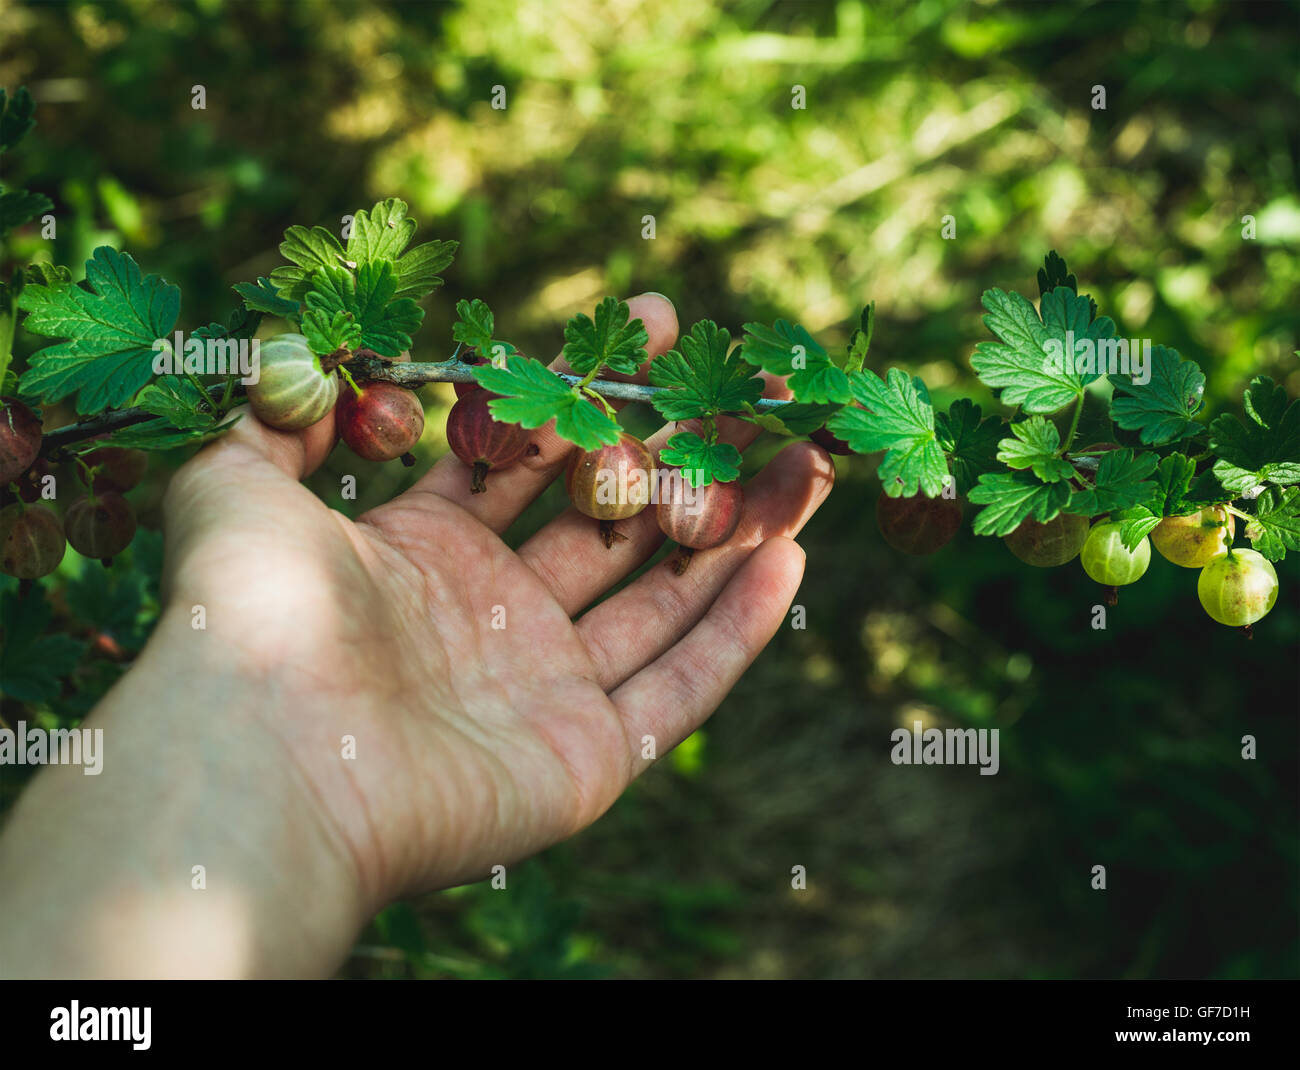 Mano d'uomo picking gooseberies maturi in giardino su soleggiate giornate estive Immagini Stock